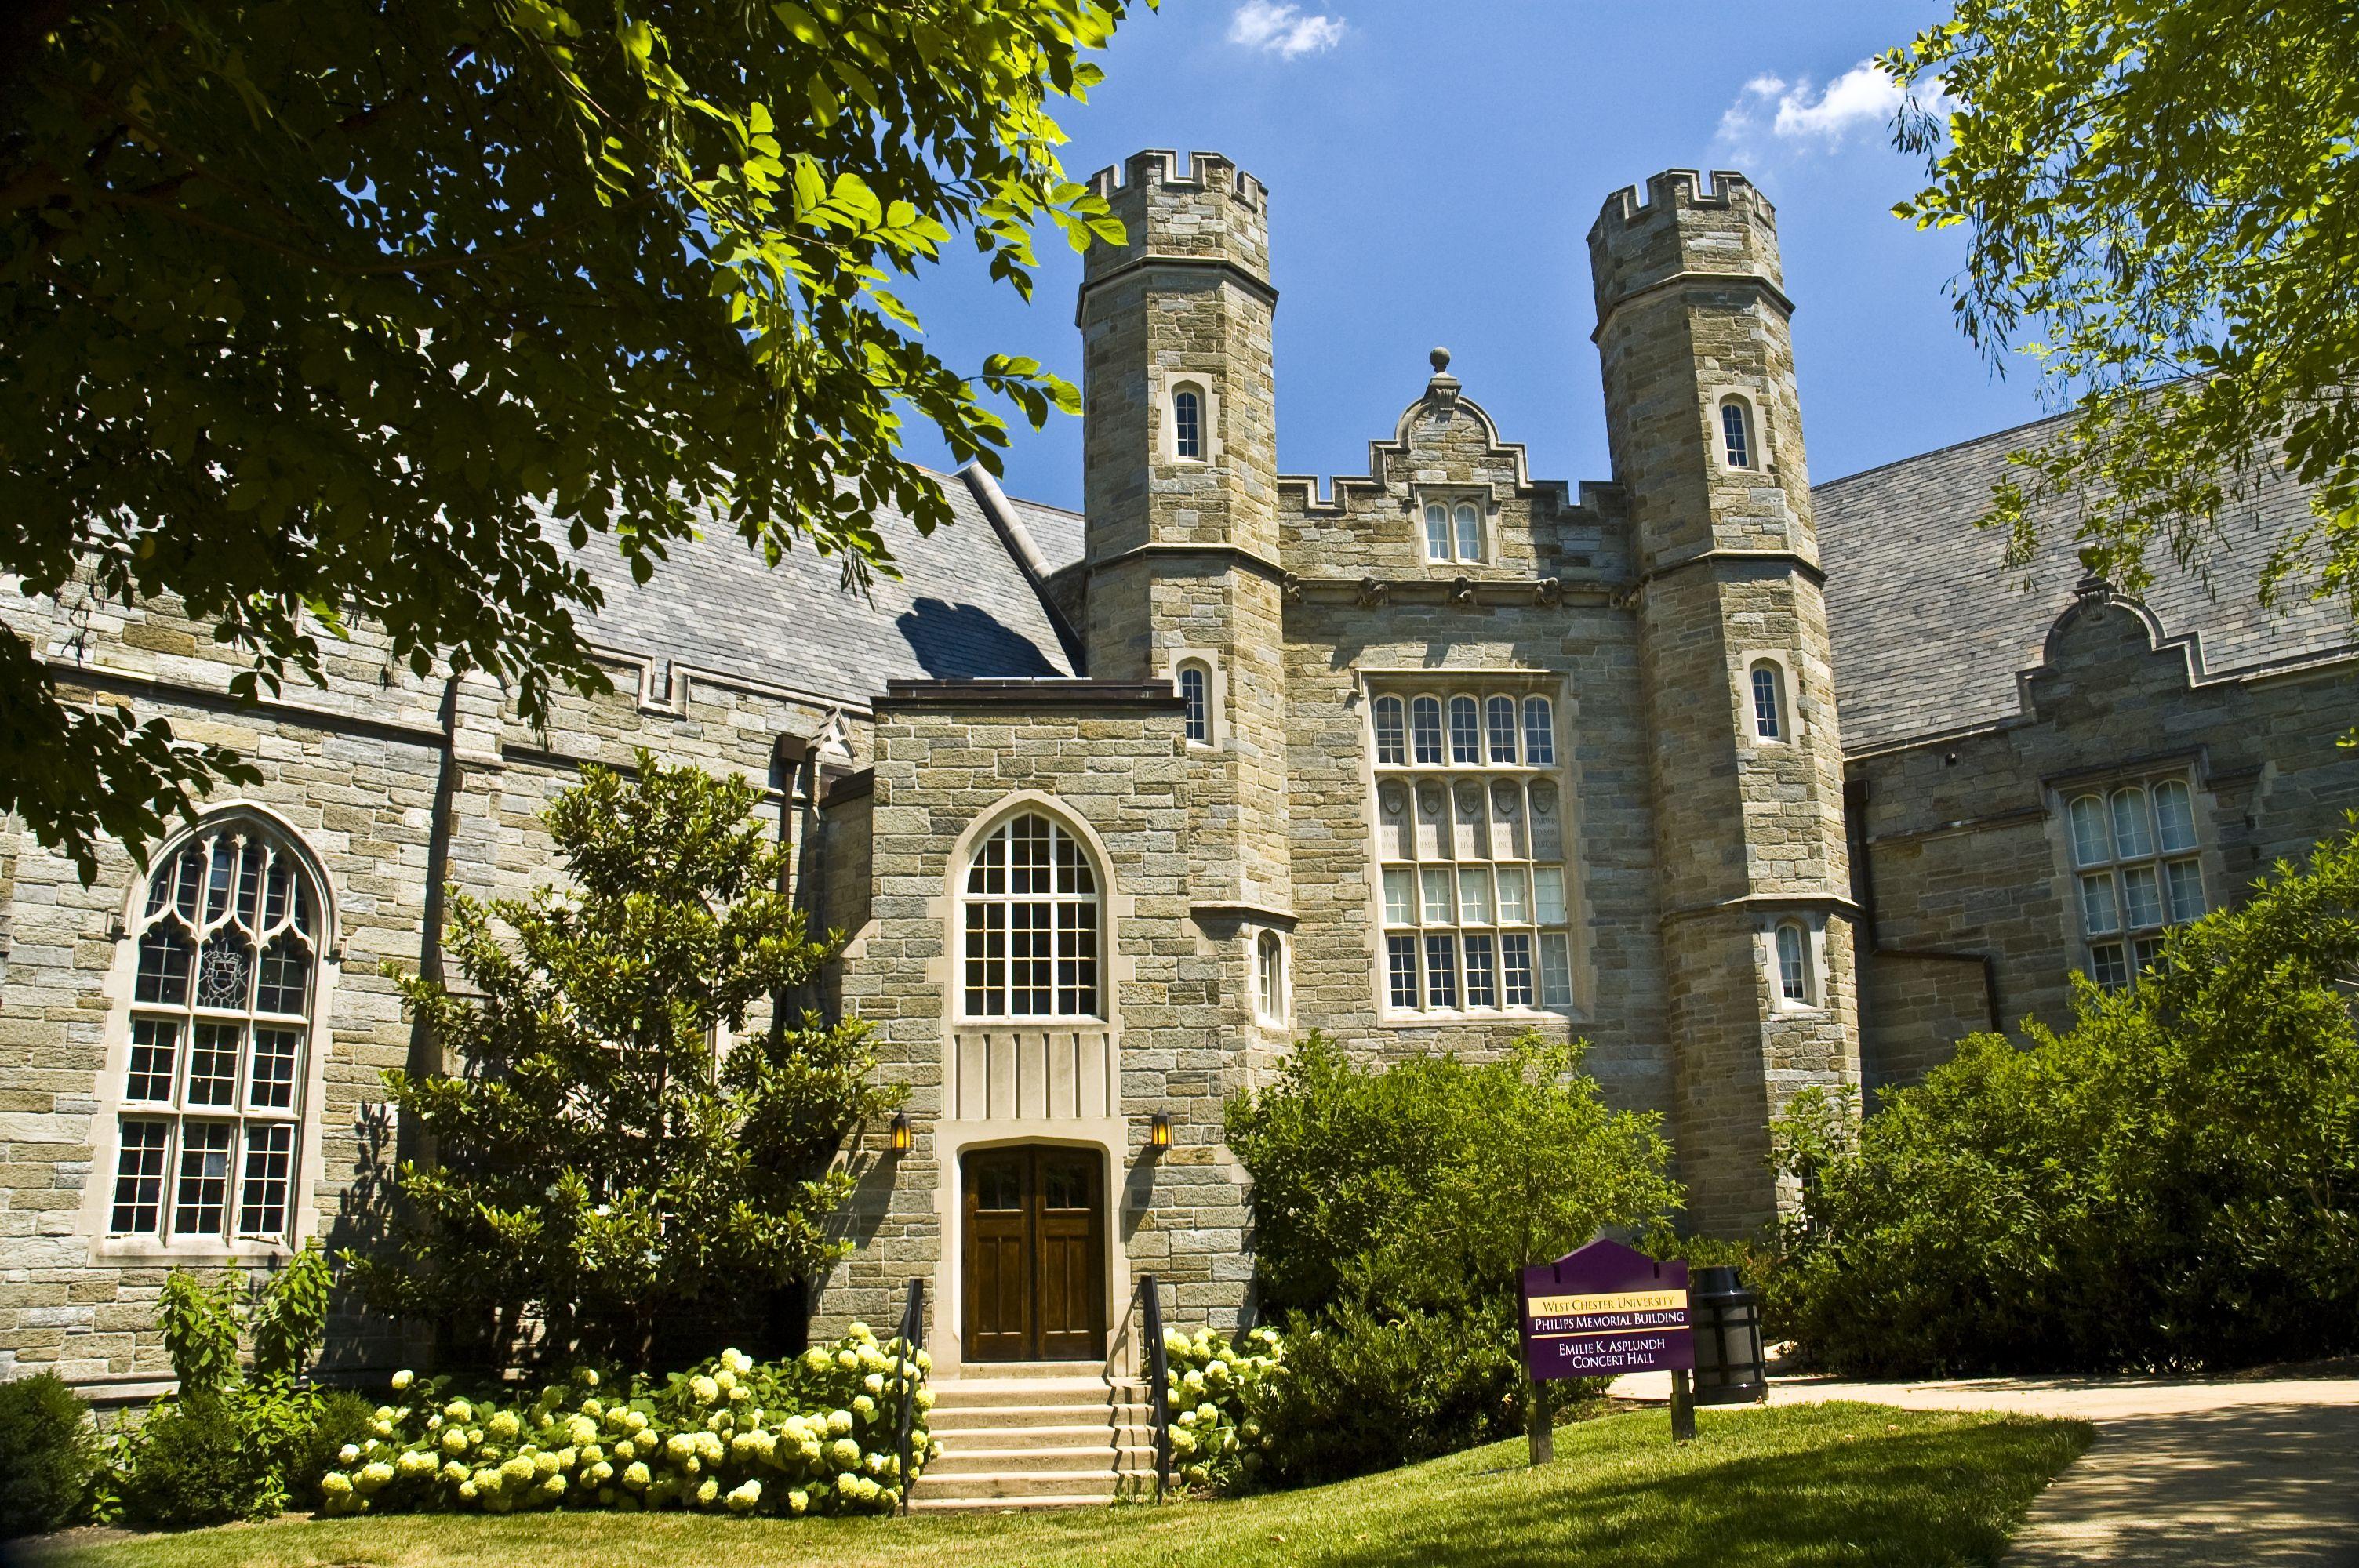 Philips Memorial Building - West Chester University's beautiful castle